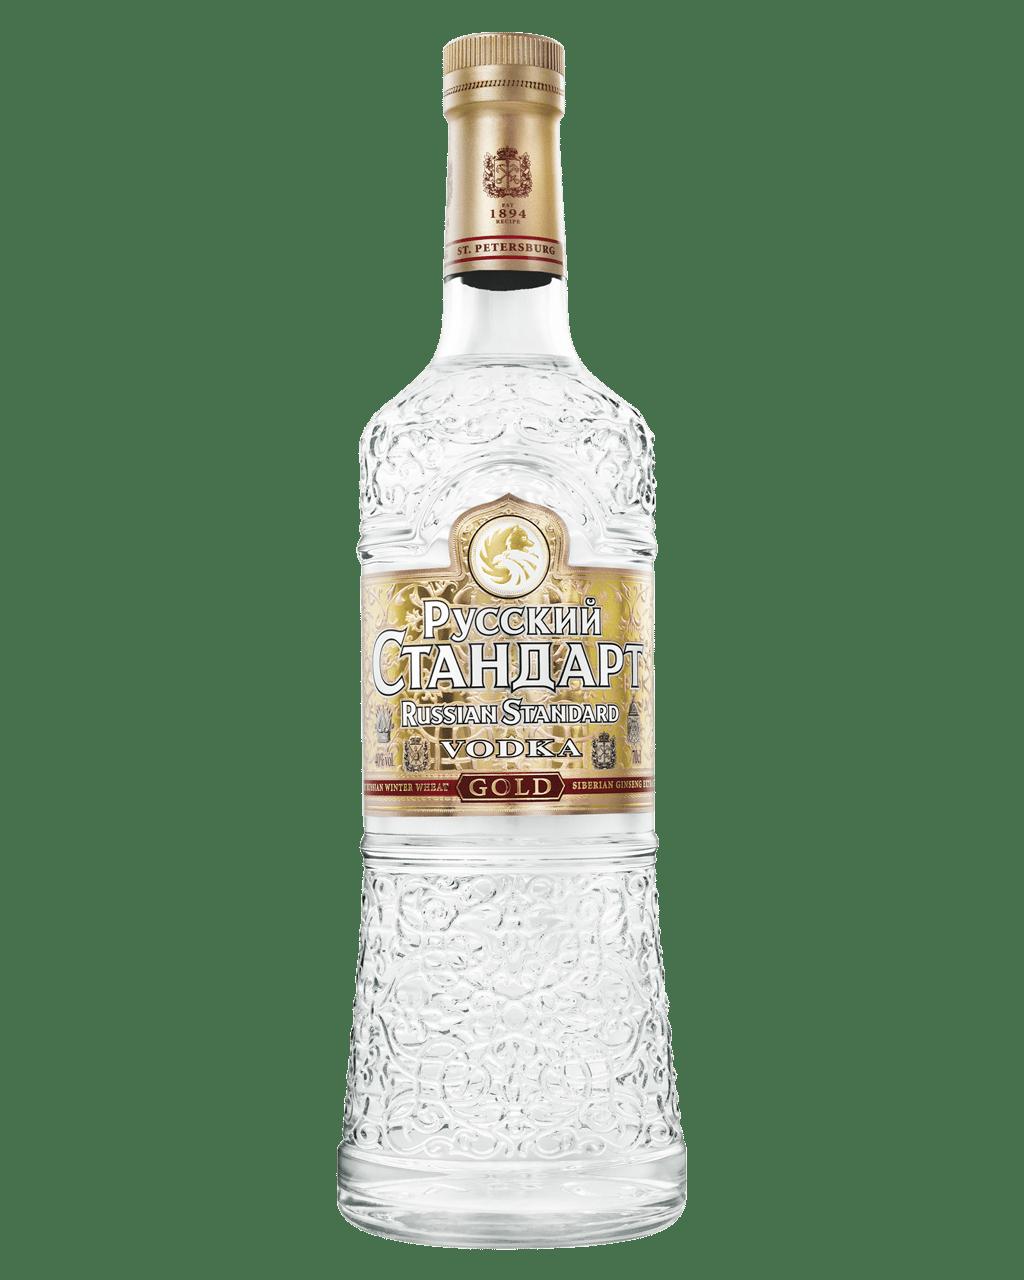 ddbc4ab24 Russian Standard Gold Vodka 700mL | Dan Murphy's | Buy Wine ...